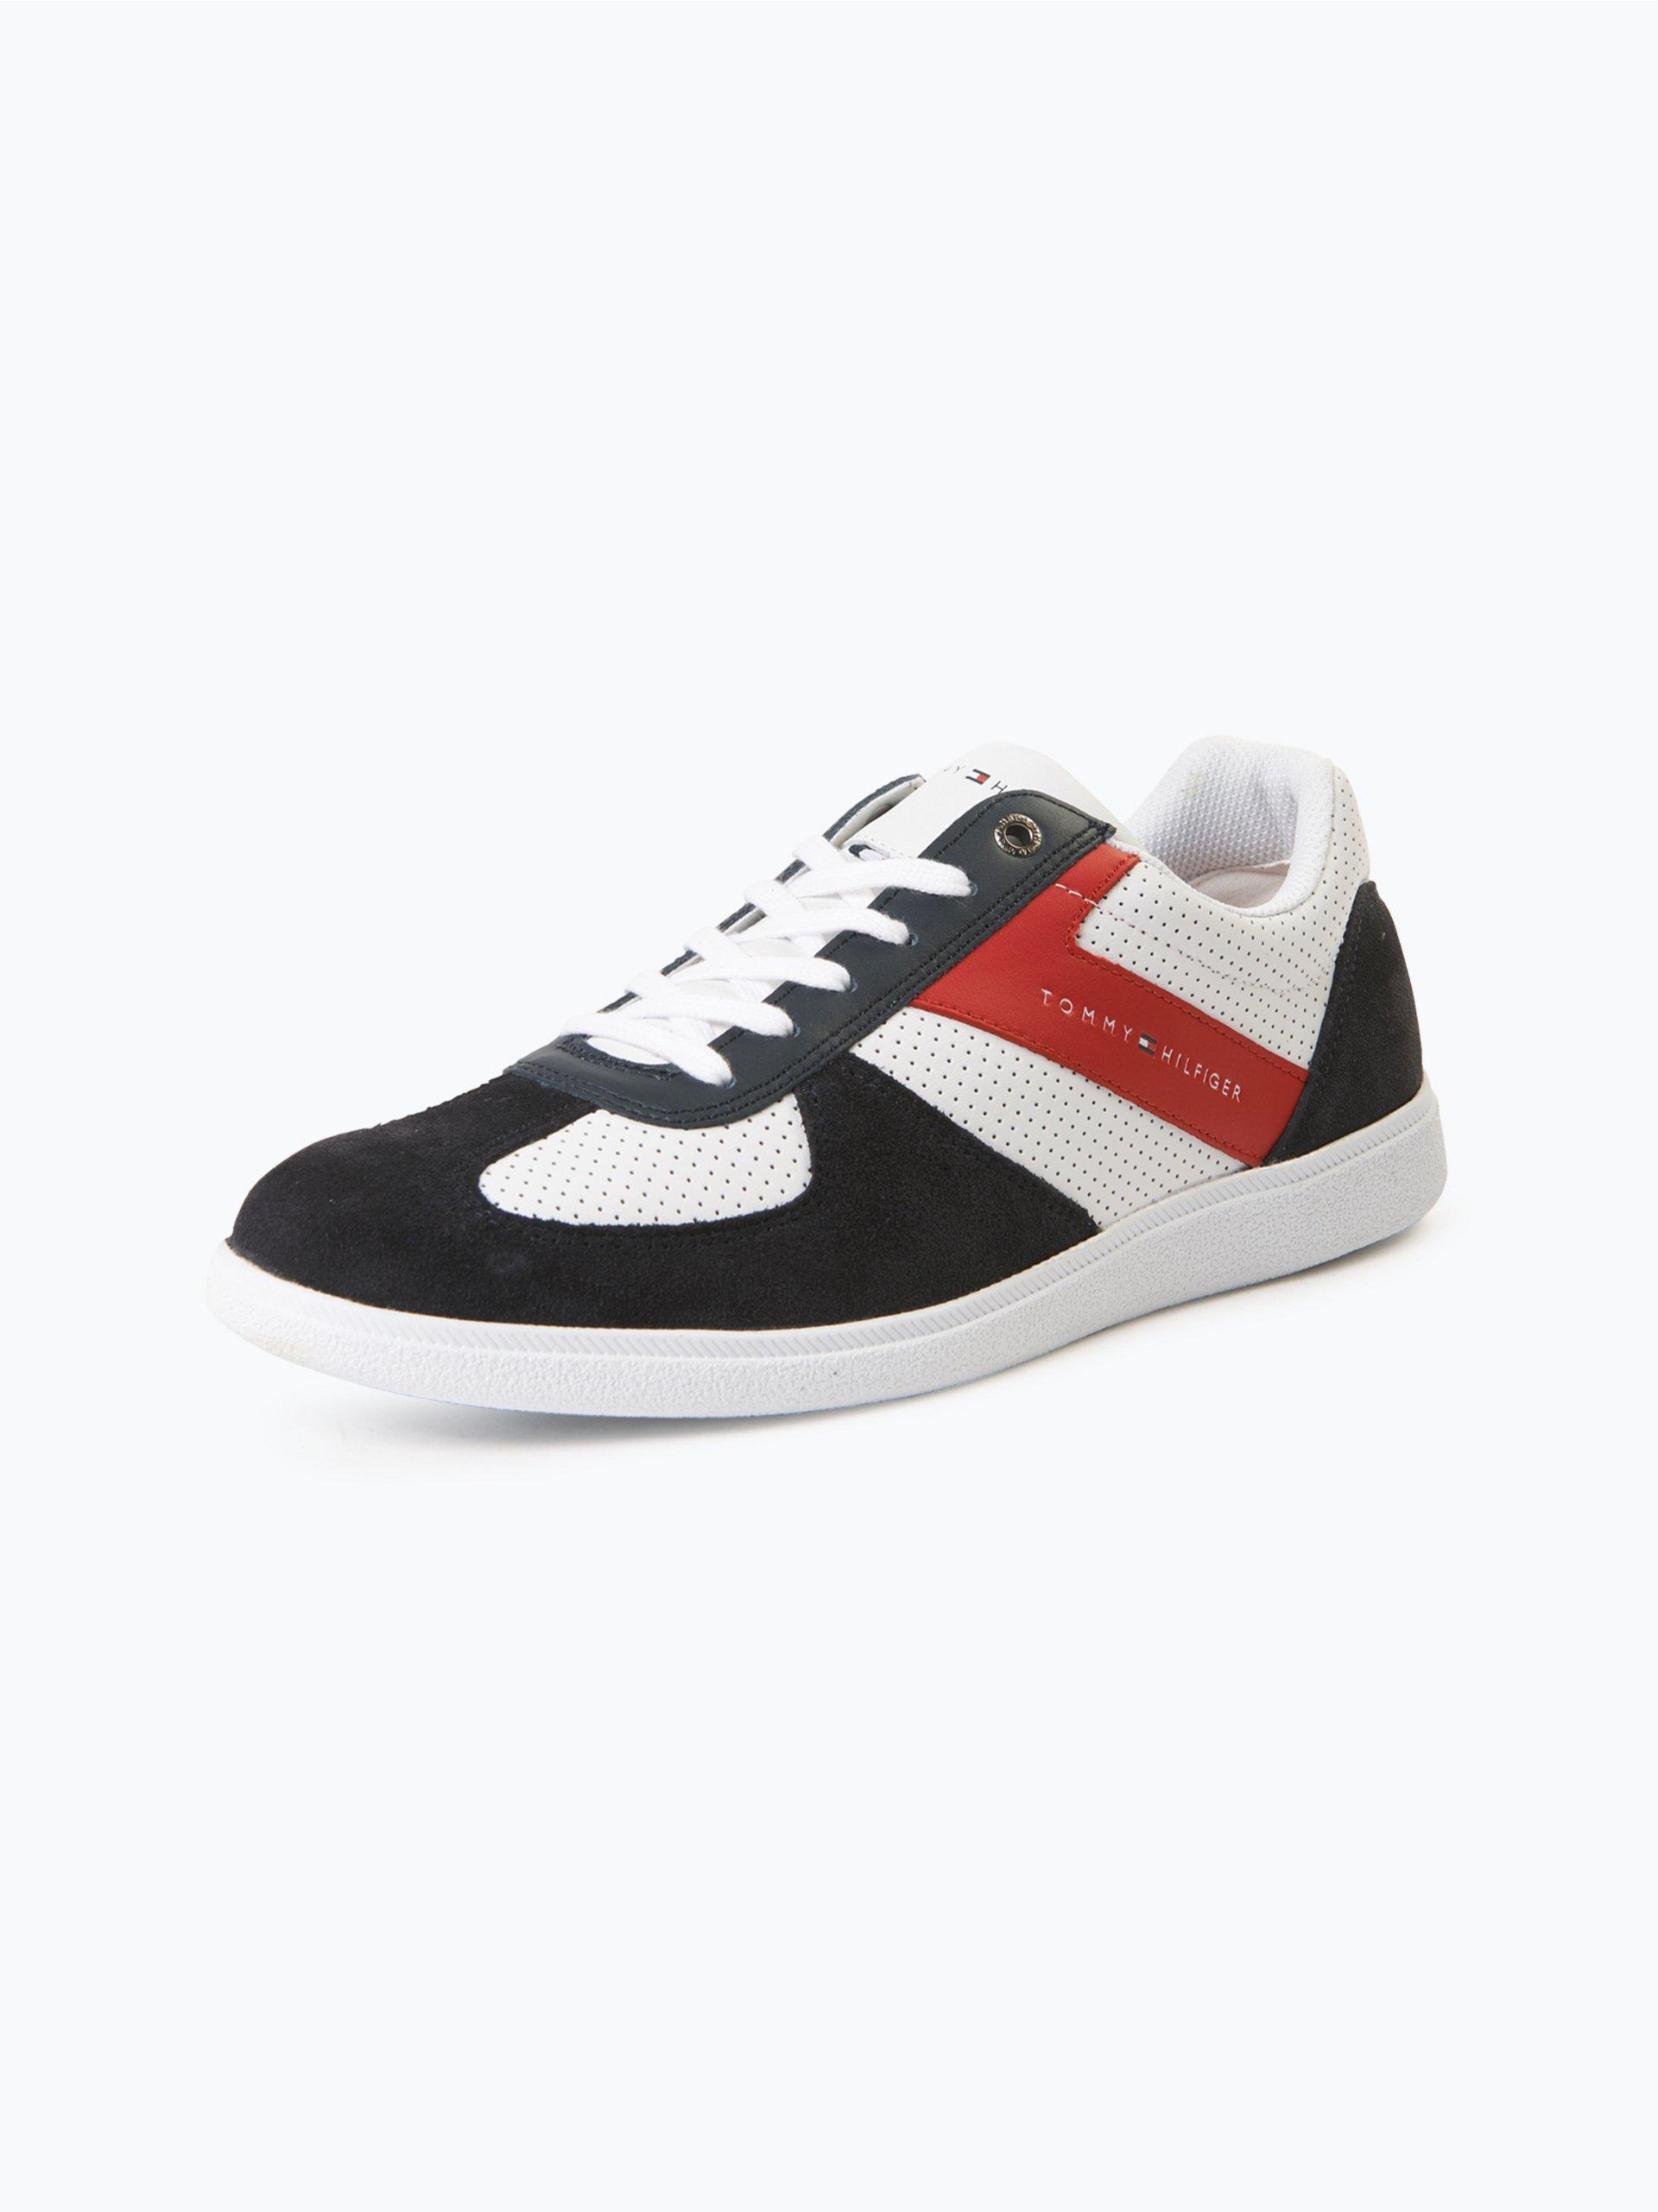 tommy hilfiger herren sneaker aus leder danny 2 online kaufen peek und cloppenburg de. Black Bedroom Furniture Sets. Home Design Ideas